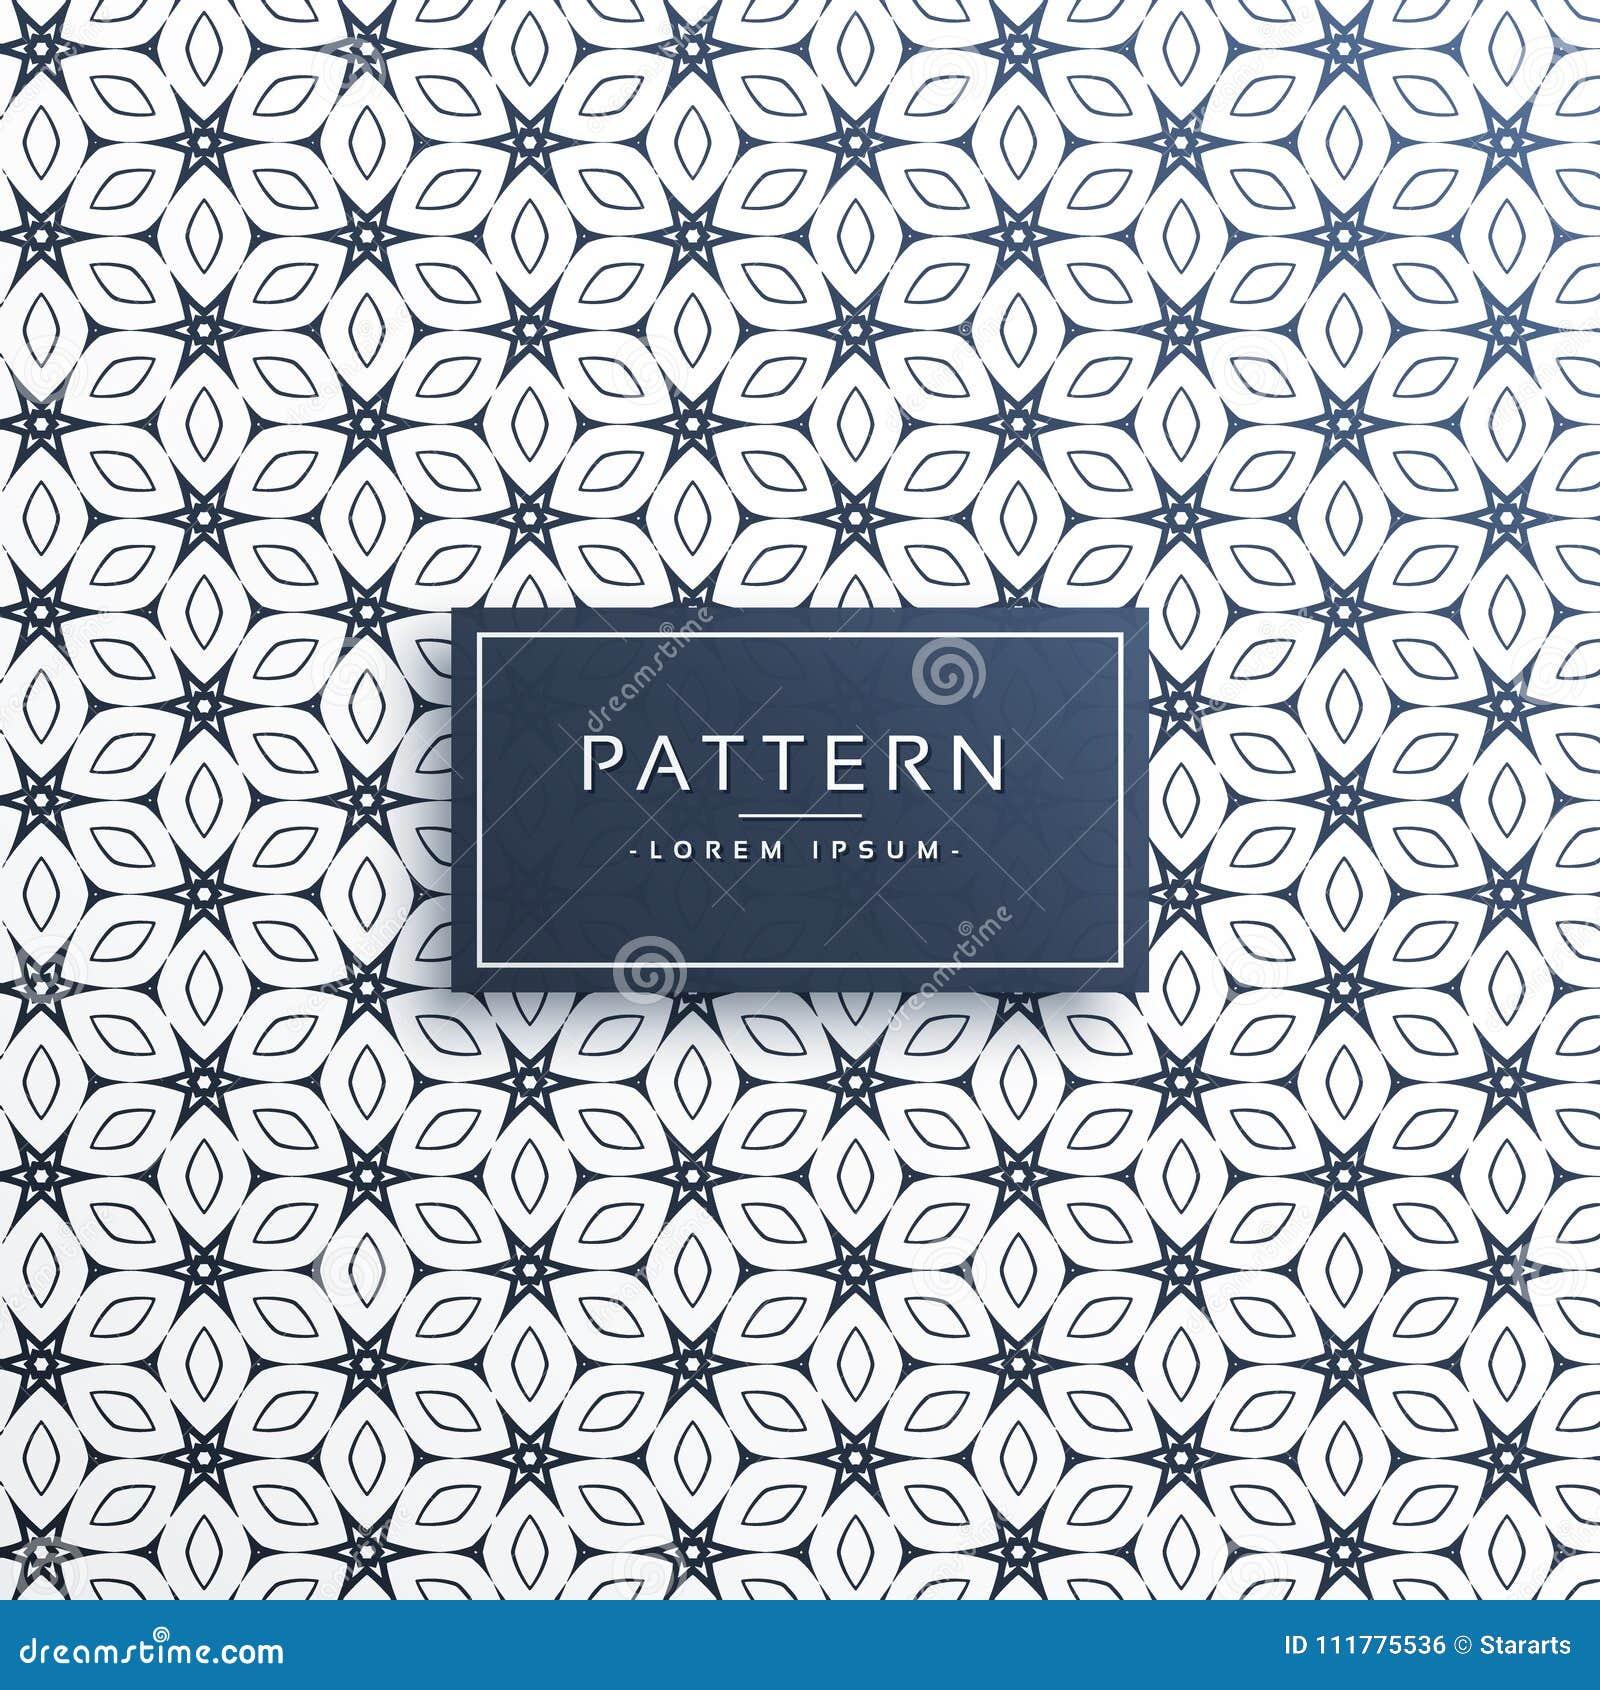 Elegant decorative vector pattern background